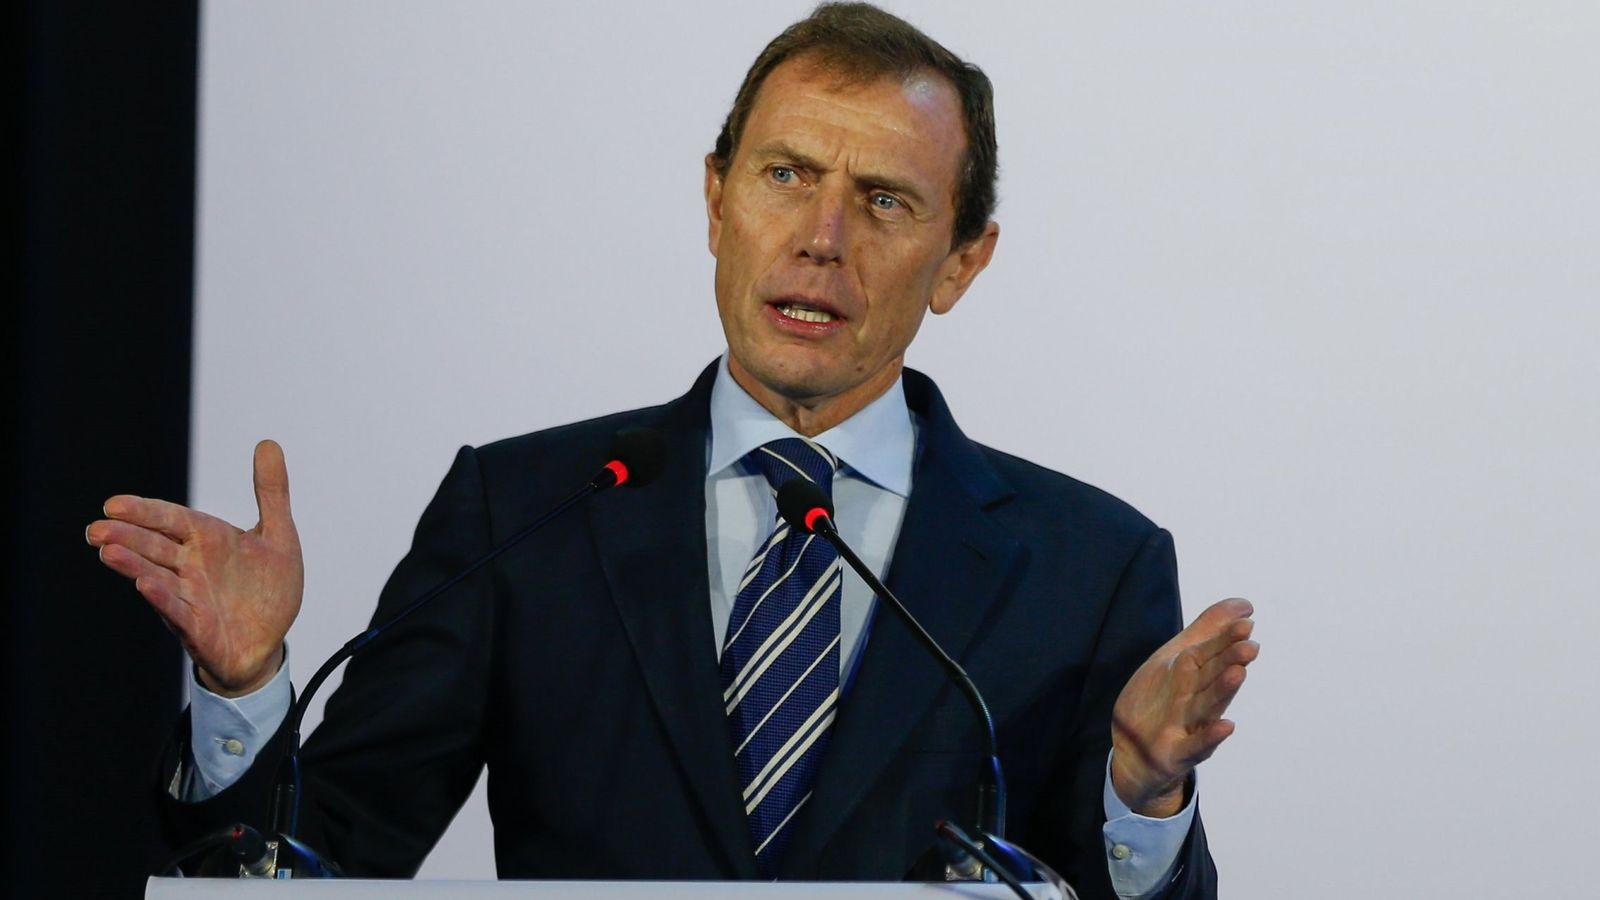 Foto: Emilio Butragueño, director de relaciones institucionales del Real Madrid. (Efe)